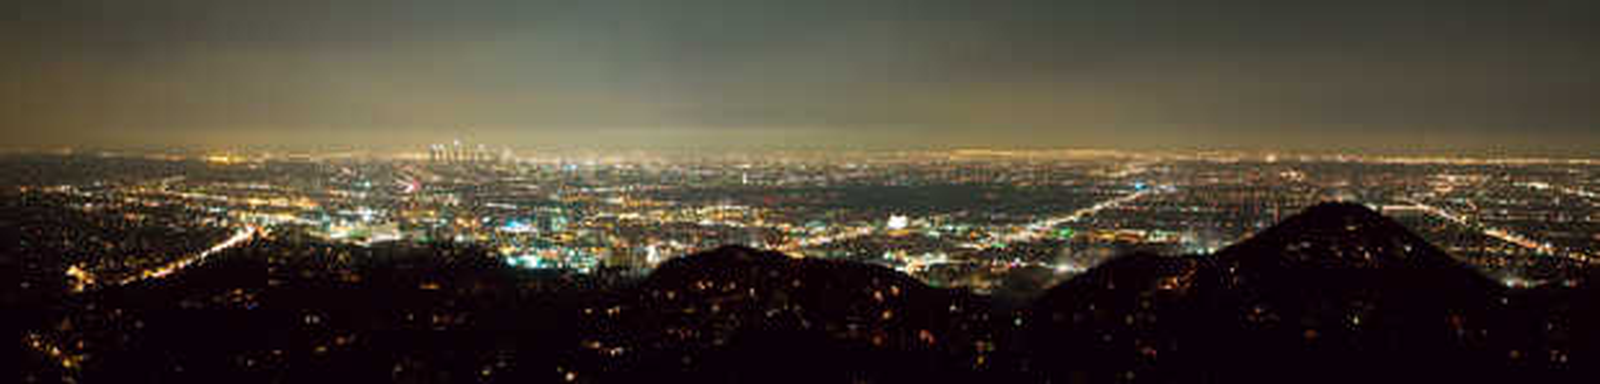 L.A.4 - Christian Stoll